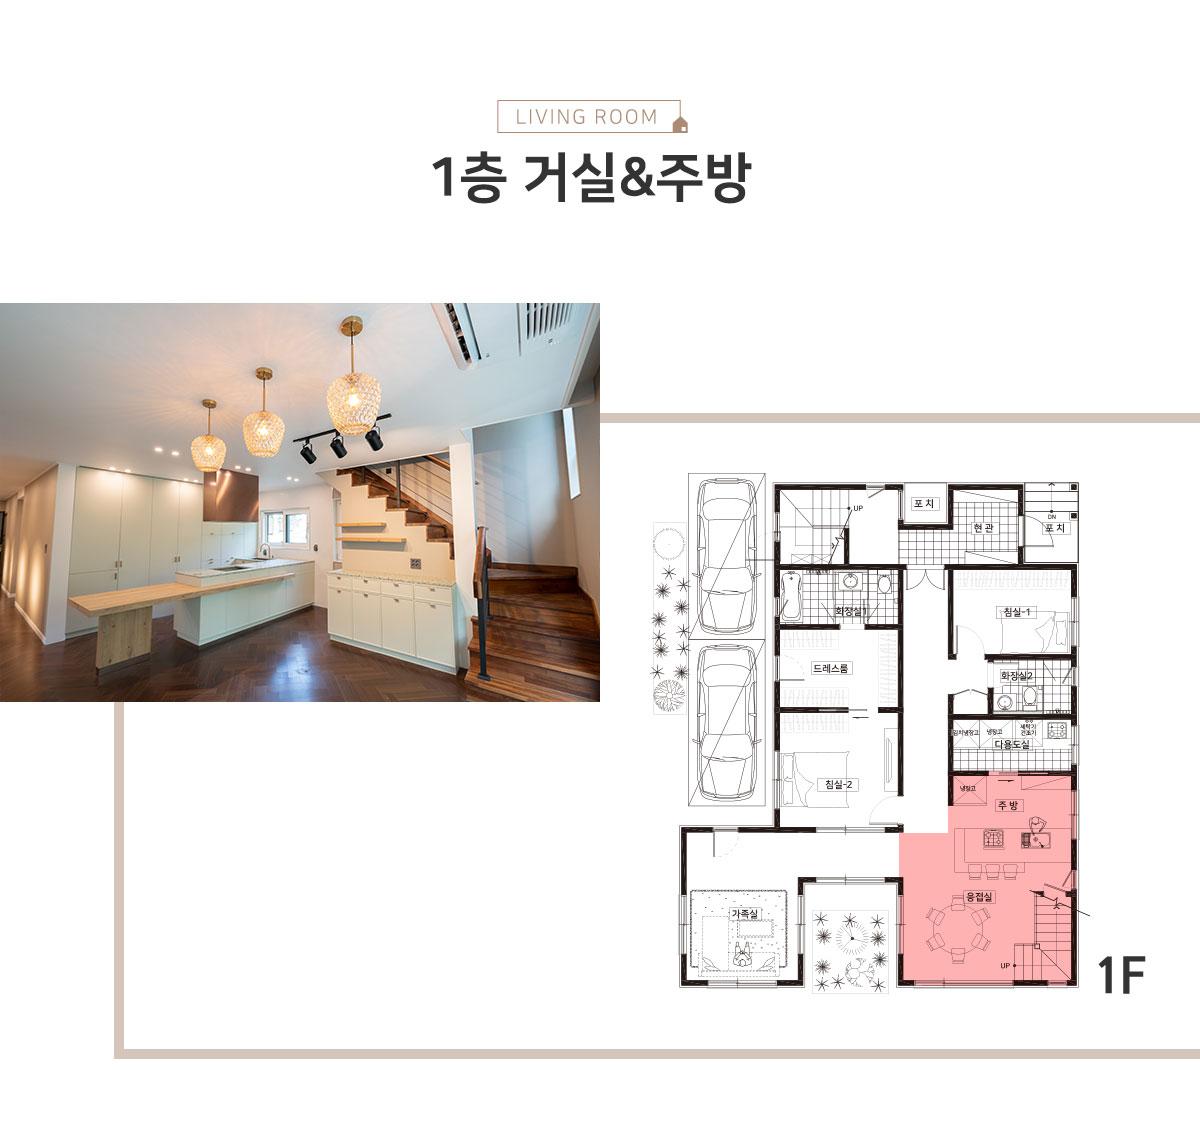 003_living-room_경기-용인-기흥구-중동_이문식_01.jpg